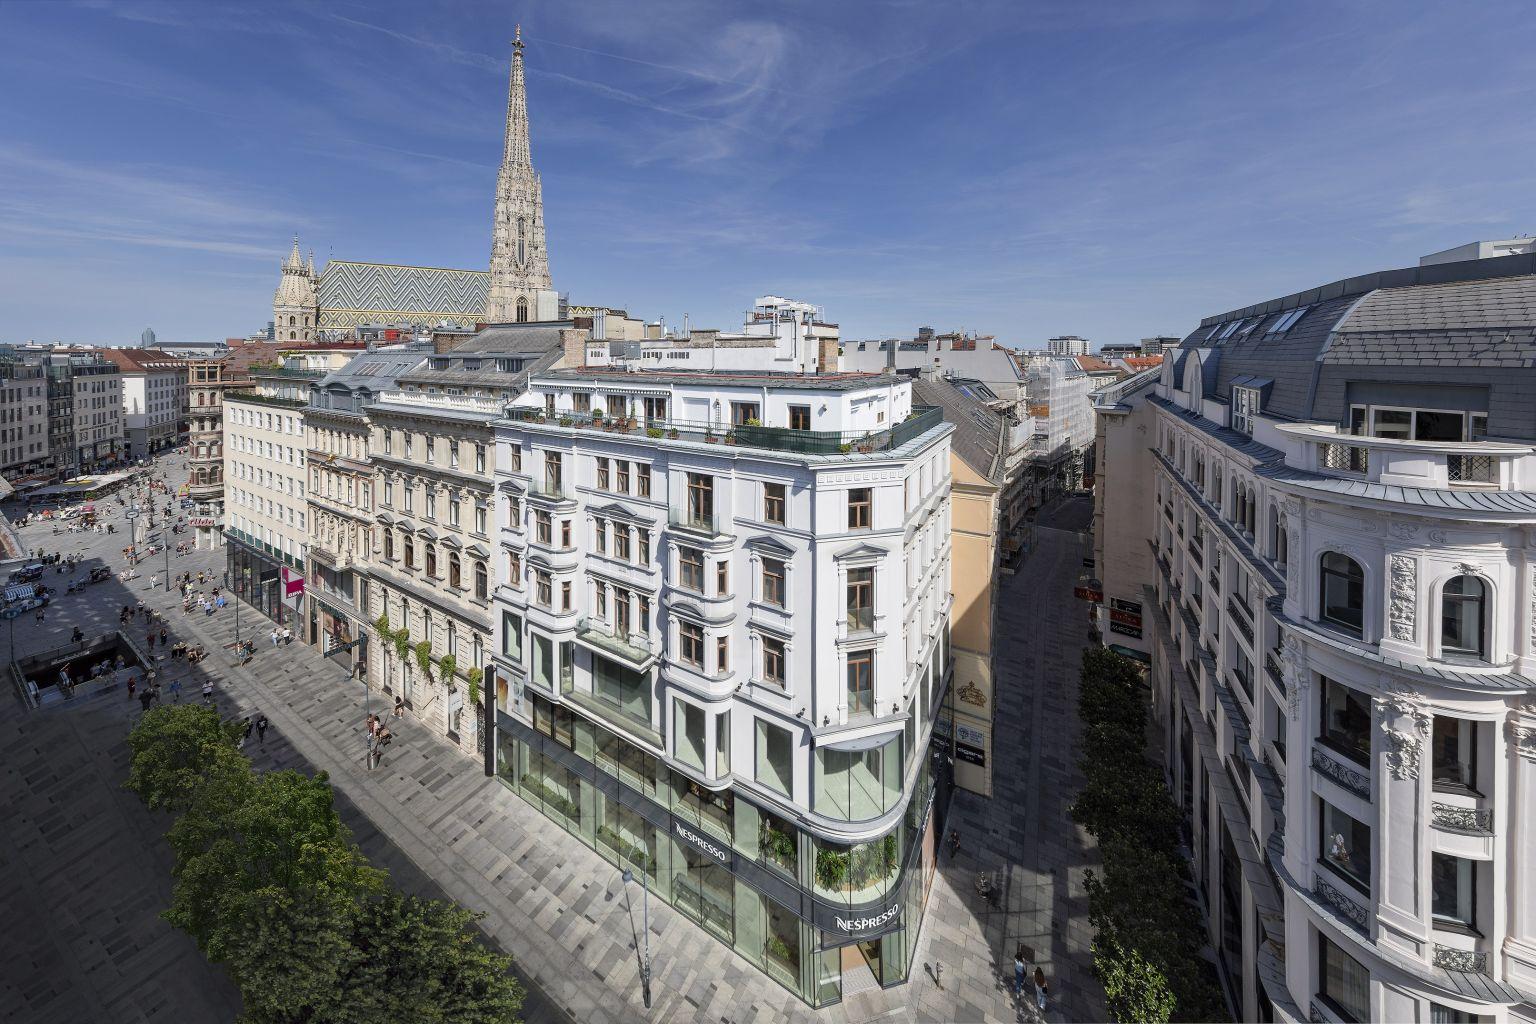 Hines vermietet an Marc O'Polo in Wien